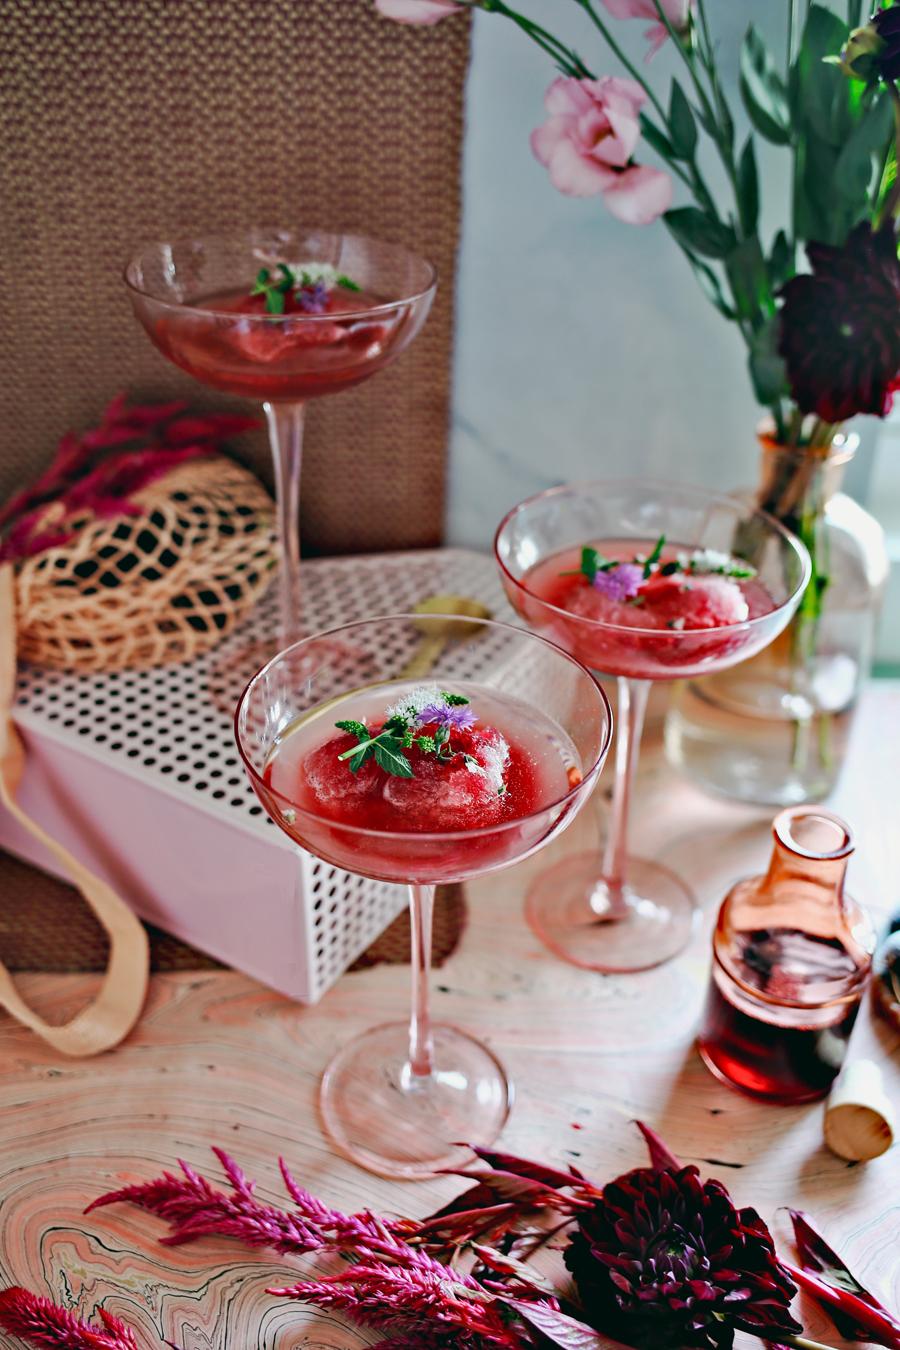 01_Frozen-Cherry-Shrub-Float-Cocktail-Dine-X-Design.jpg